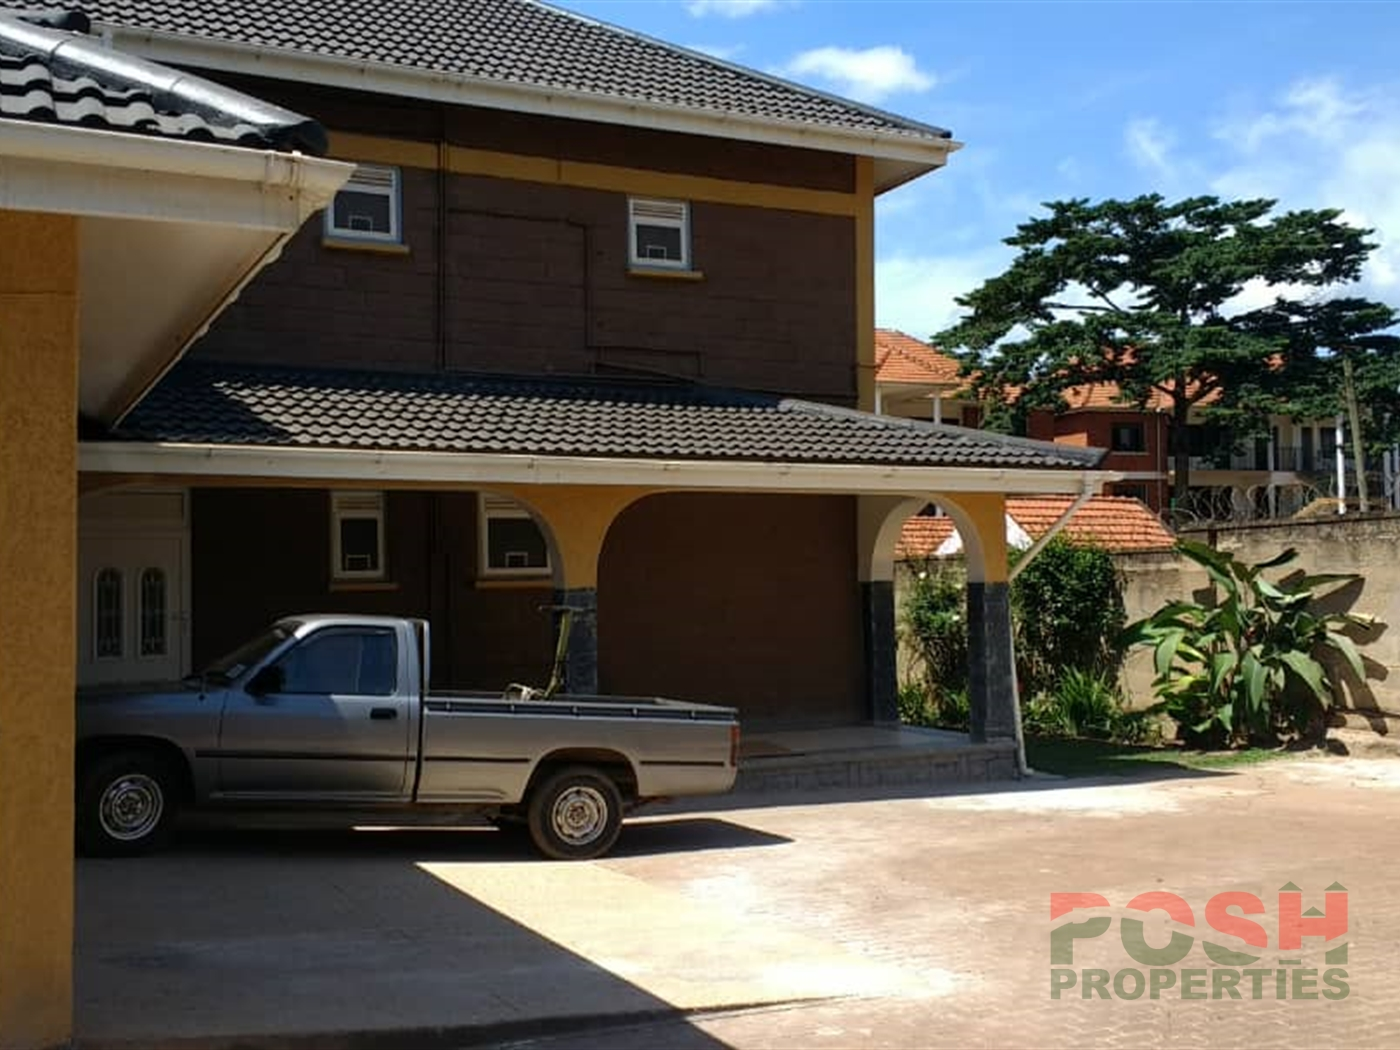 Mansion for rent in Gaba Kampala